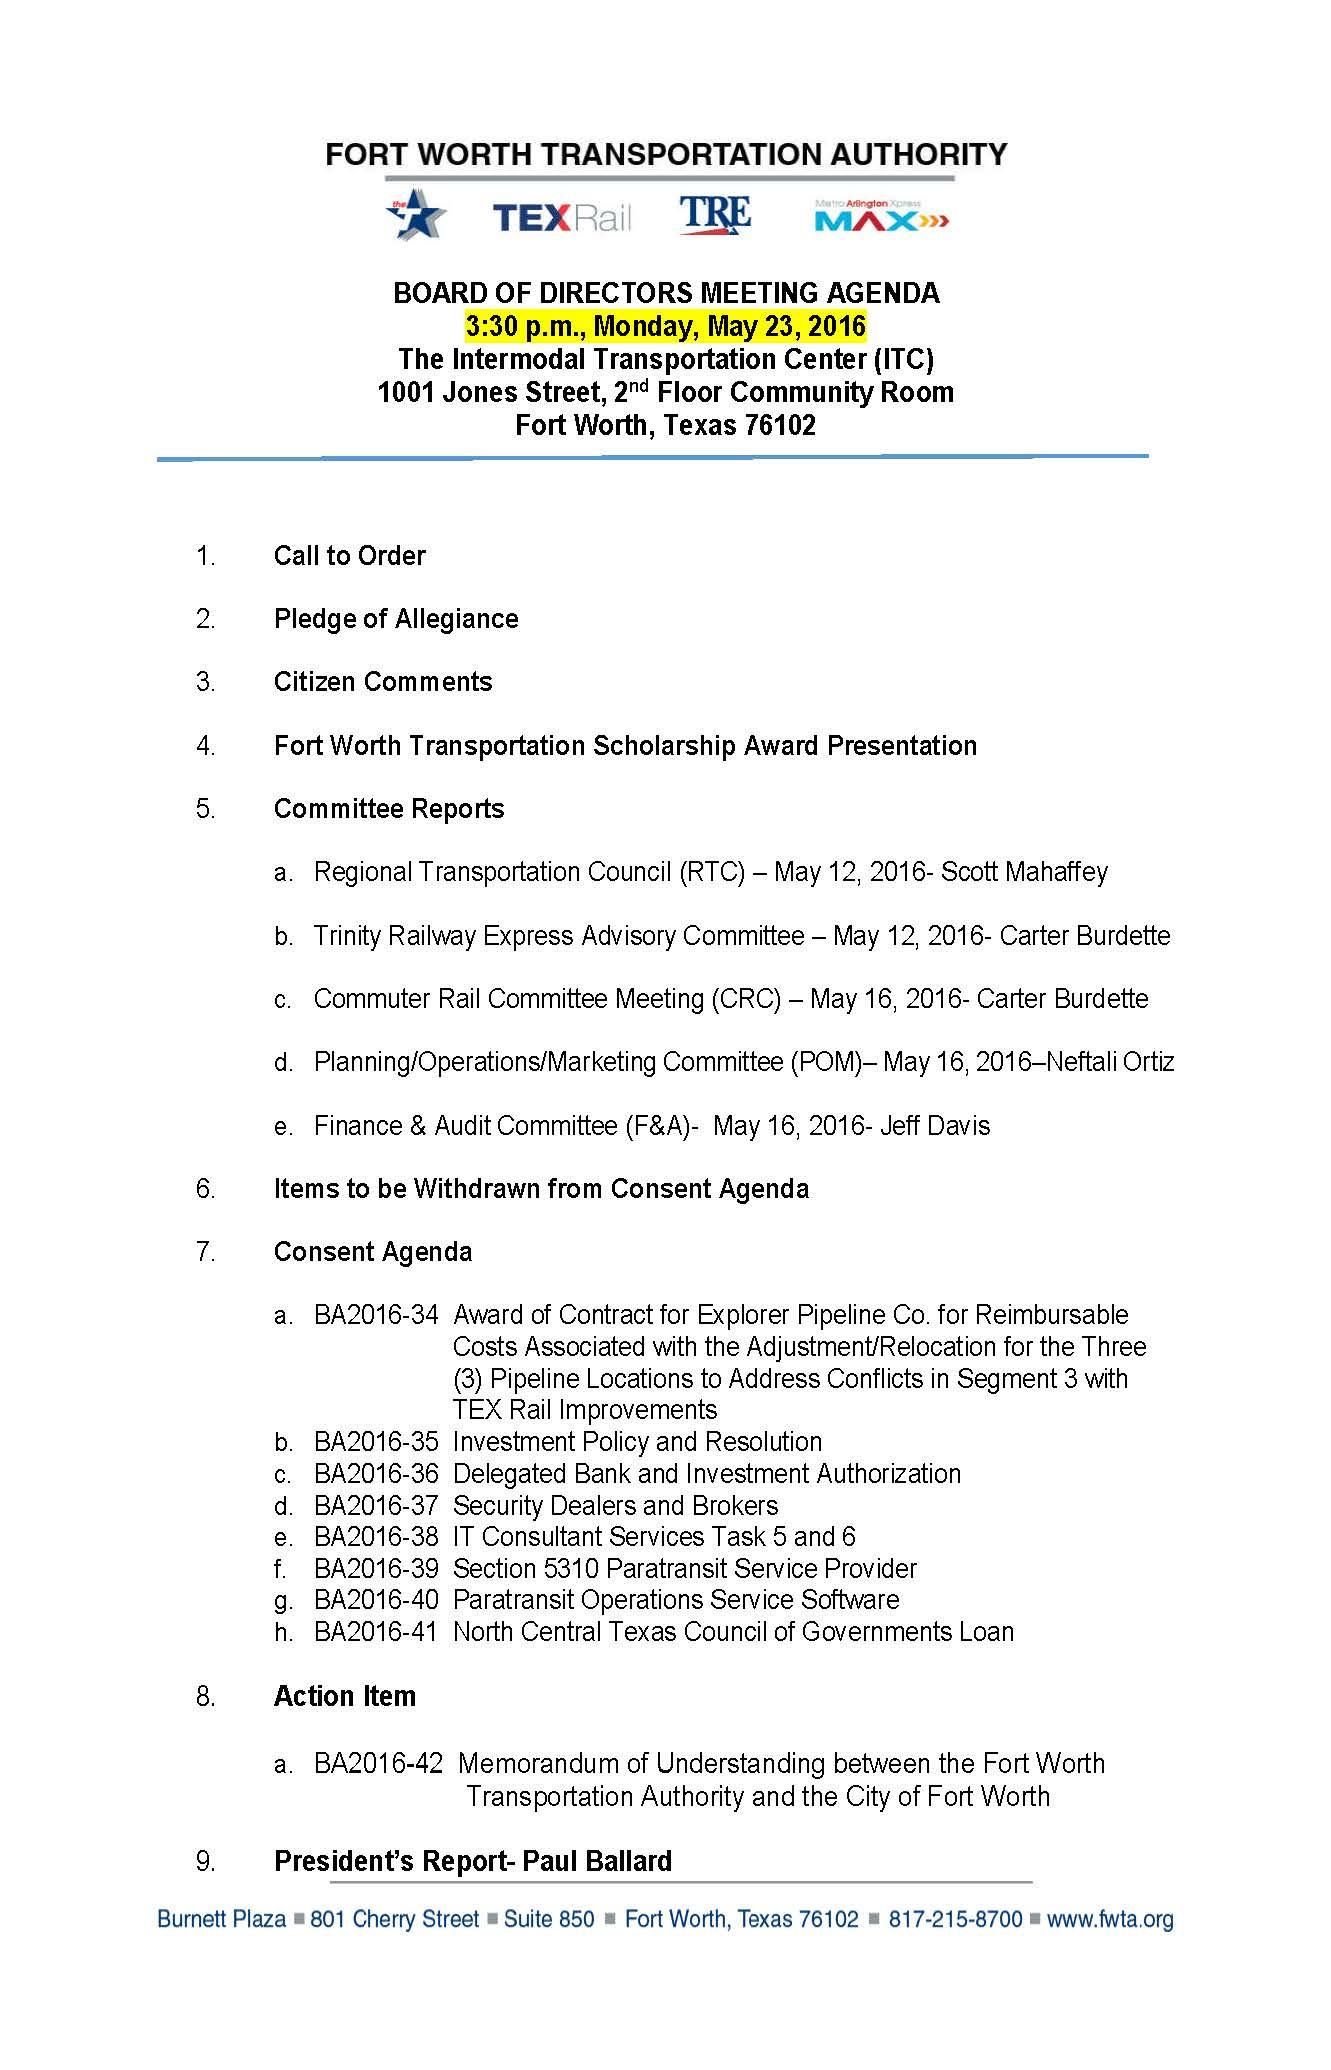 Board Of Directors Strategy Meeting Agenda Template Pdf Within Town Hall Meeting Agenda Template